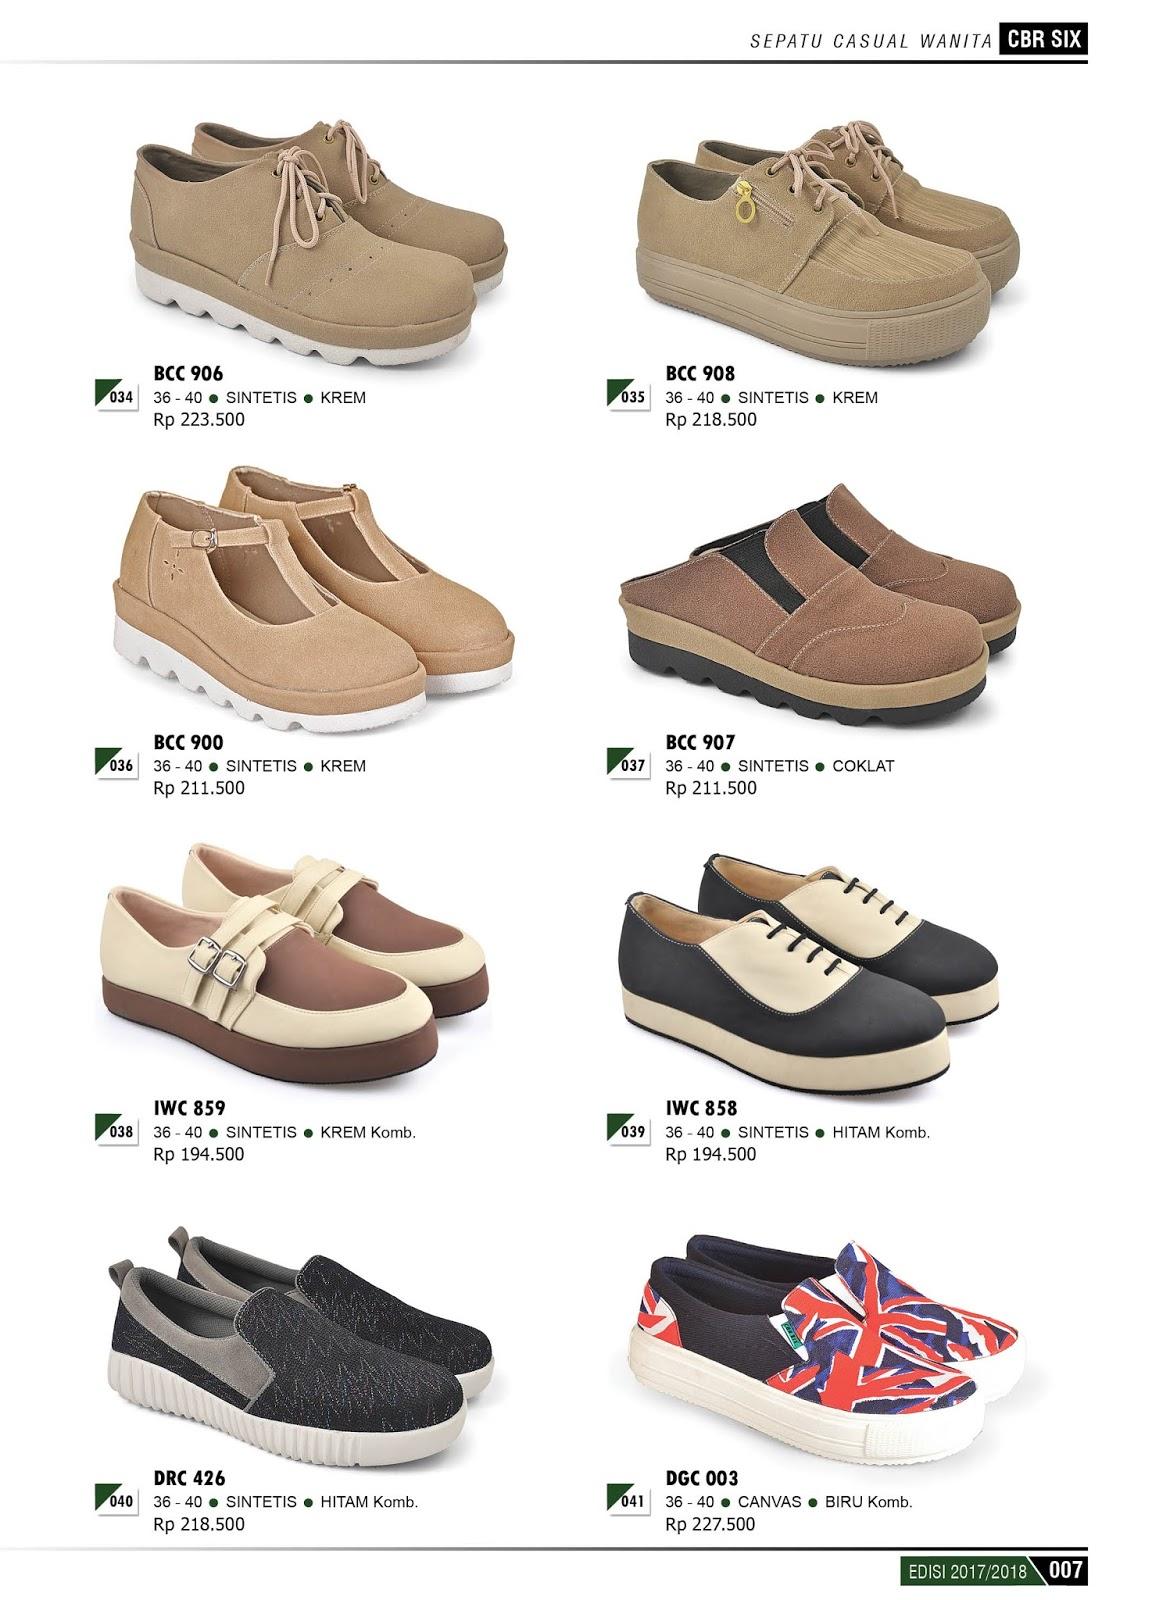 katalog produk terbaru cbr 6 six 20172018 sepatu dan sendal